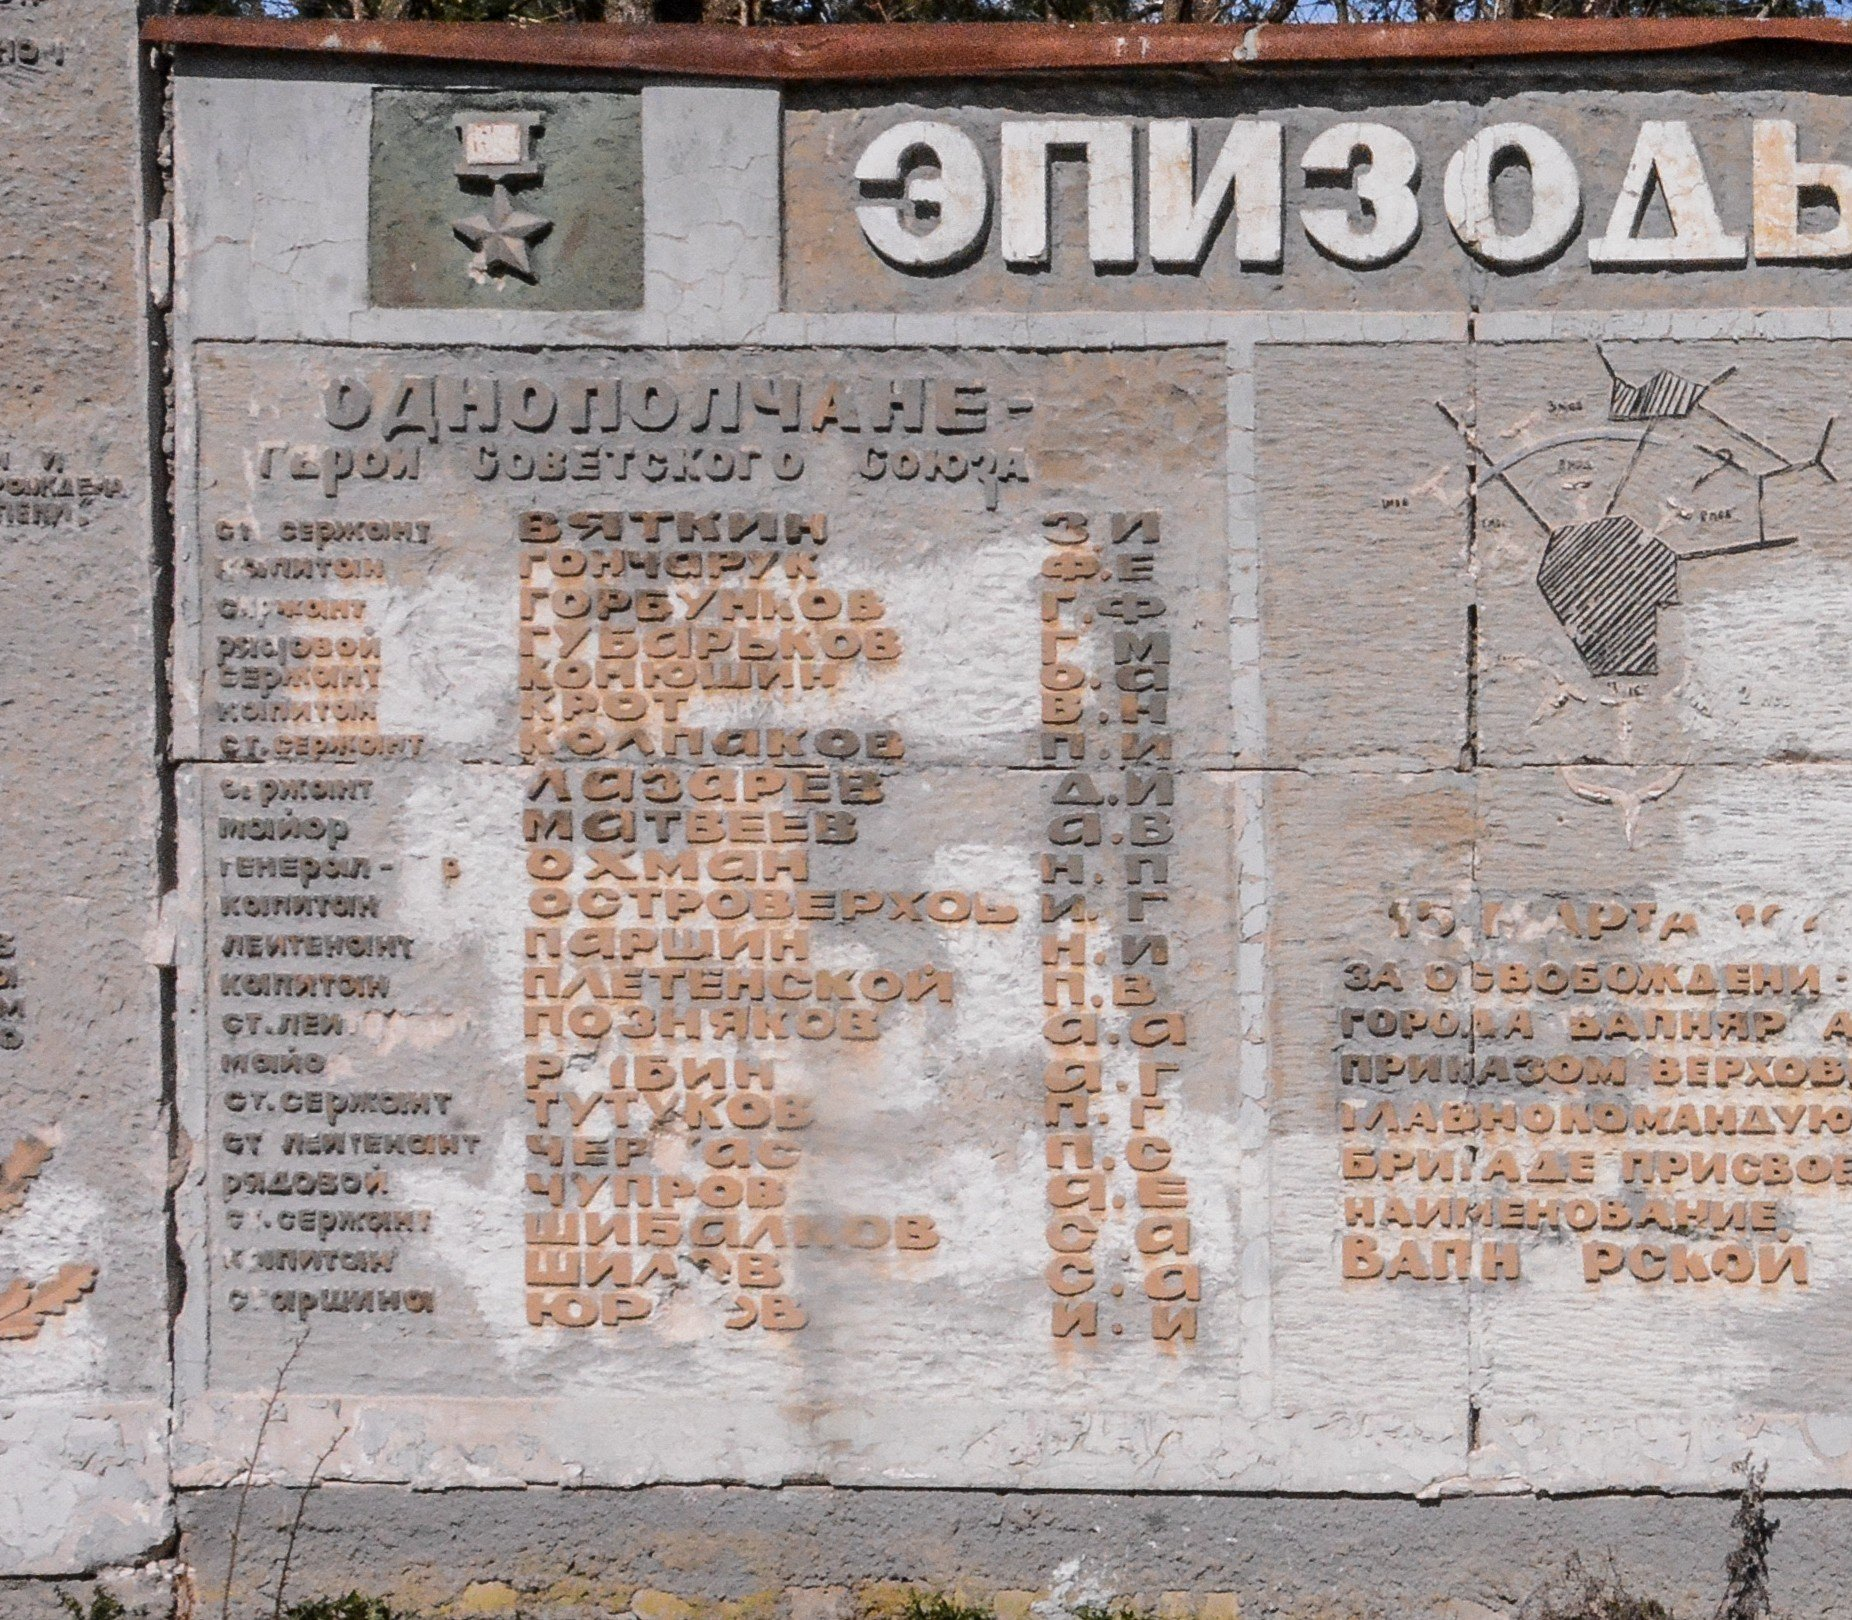 heroes of the soviet union soviet war memorial sowjetisches ehrenmal fuerstenberg droegen brandenburg deutschland lost places urbex abandoned